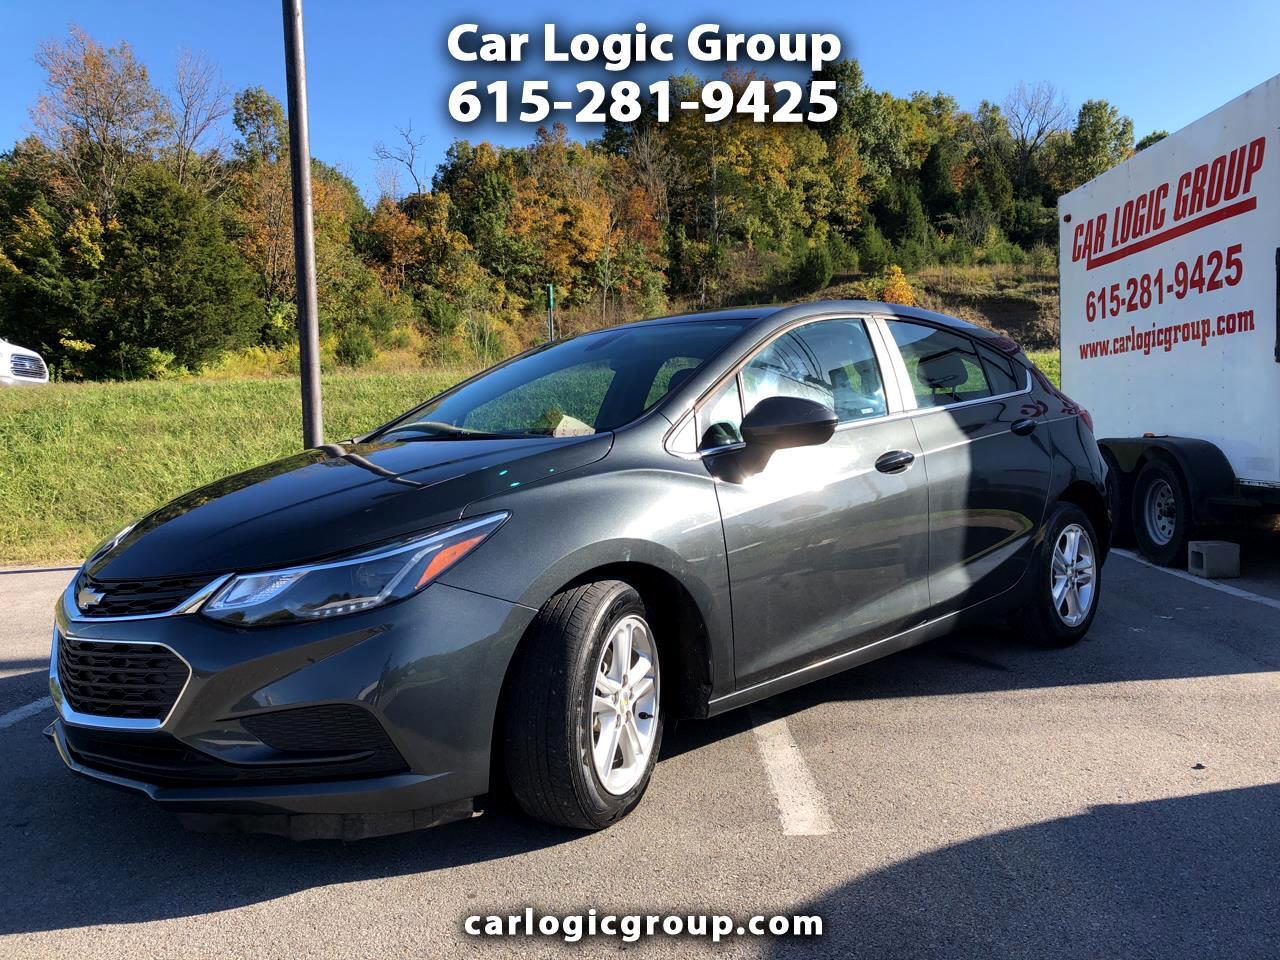 Chevrolet Cruze 4dr HB 1.4L LT w/1SD 2018